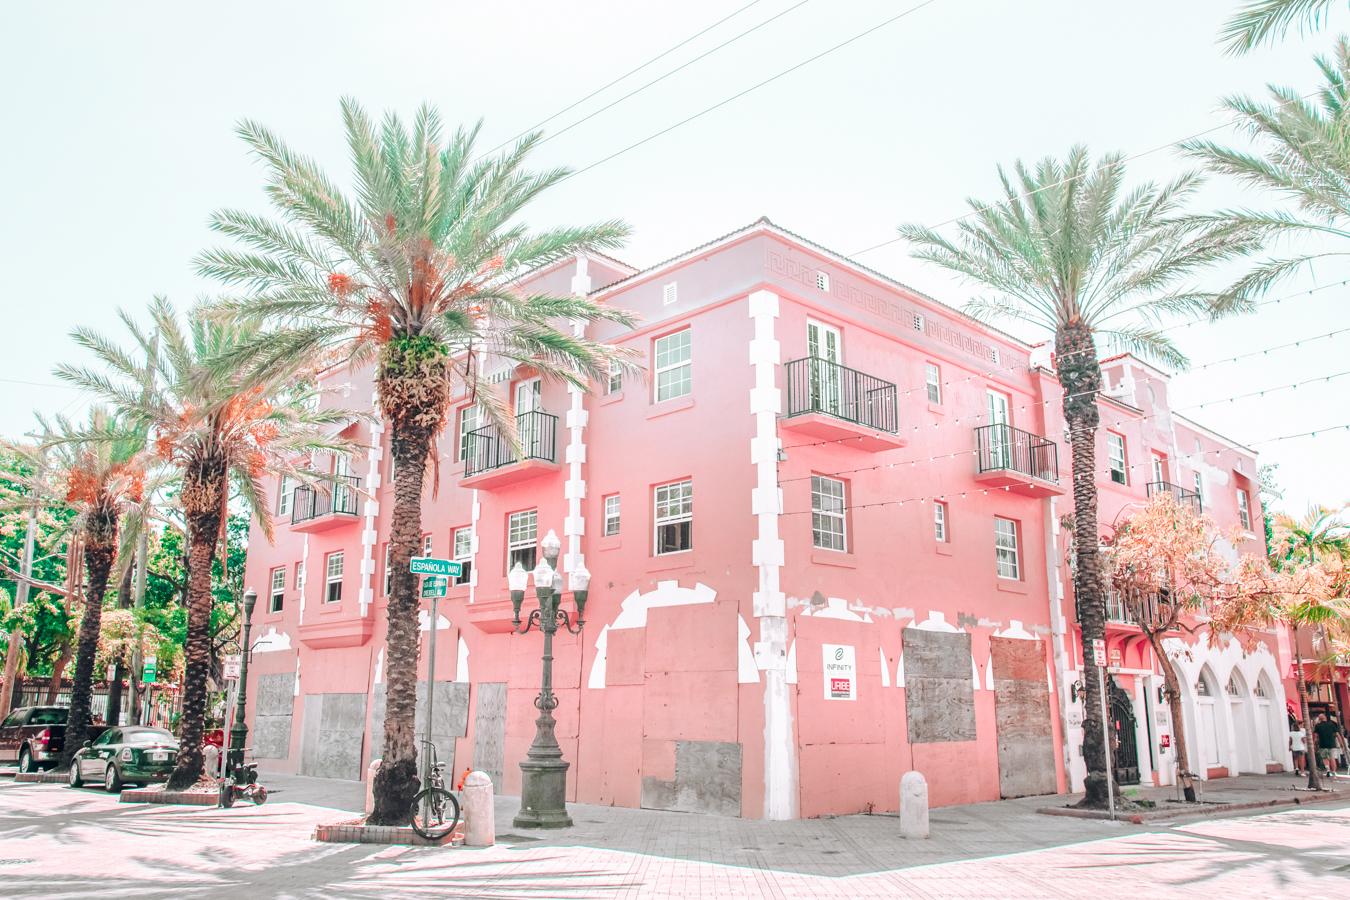 Pink house in Little Havana in Miami